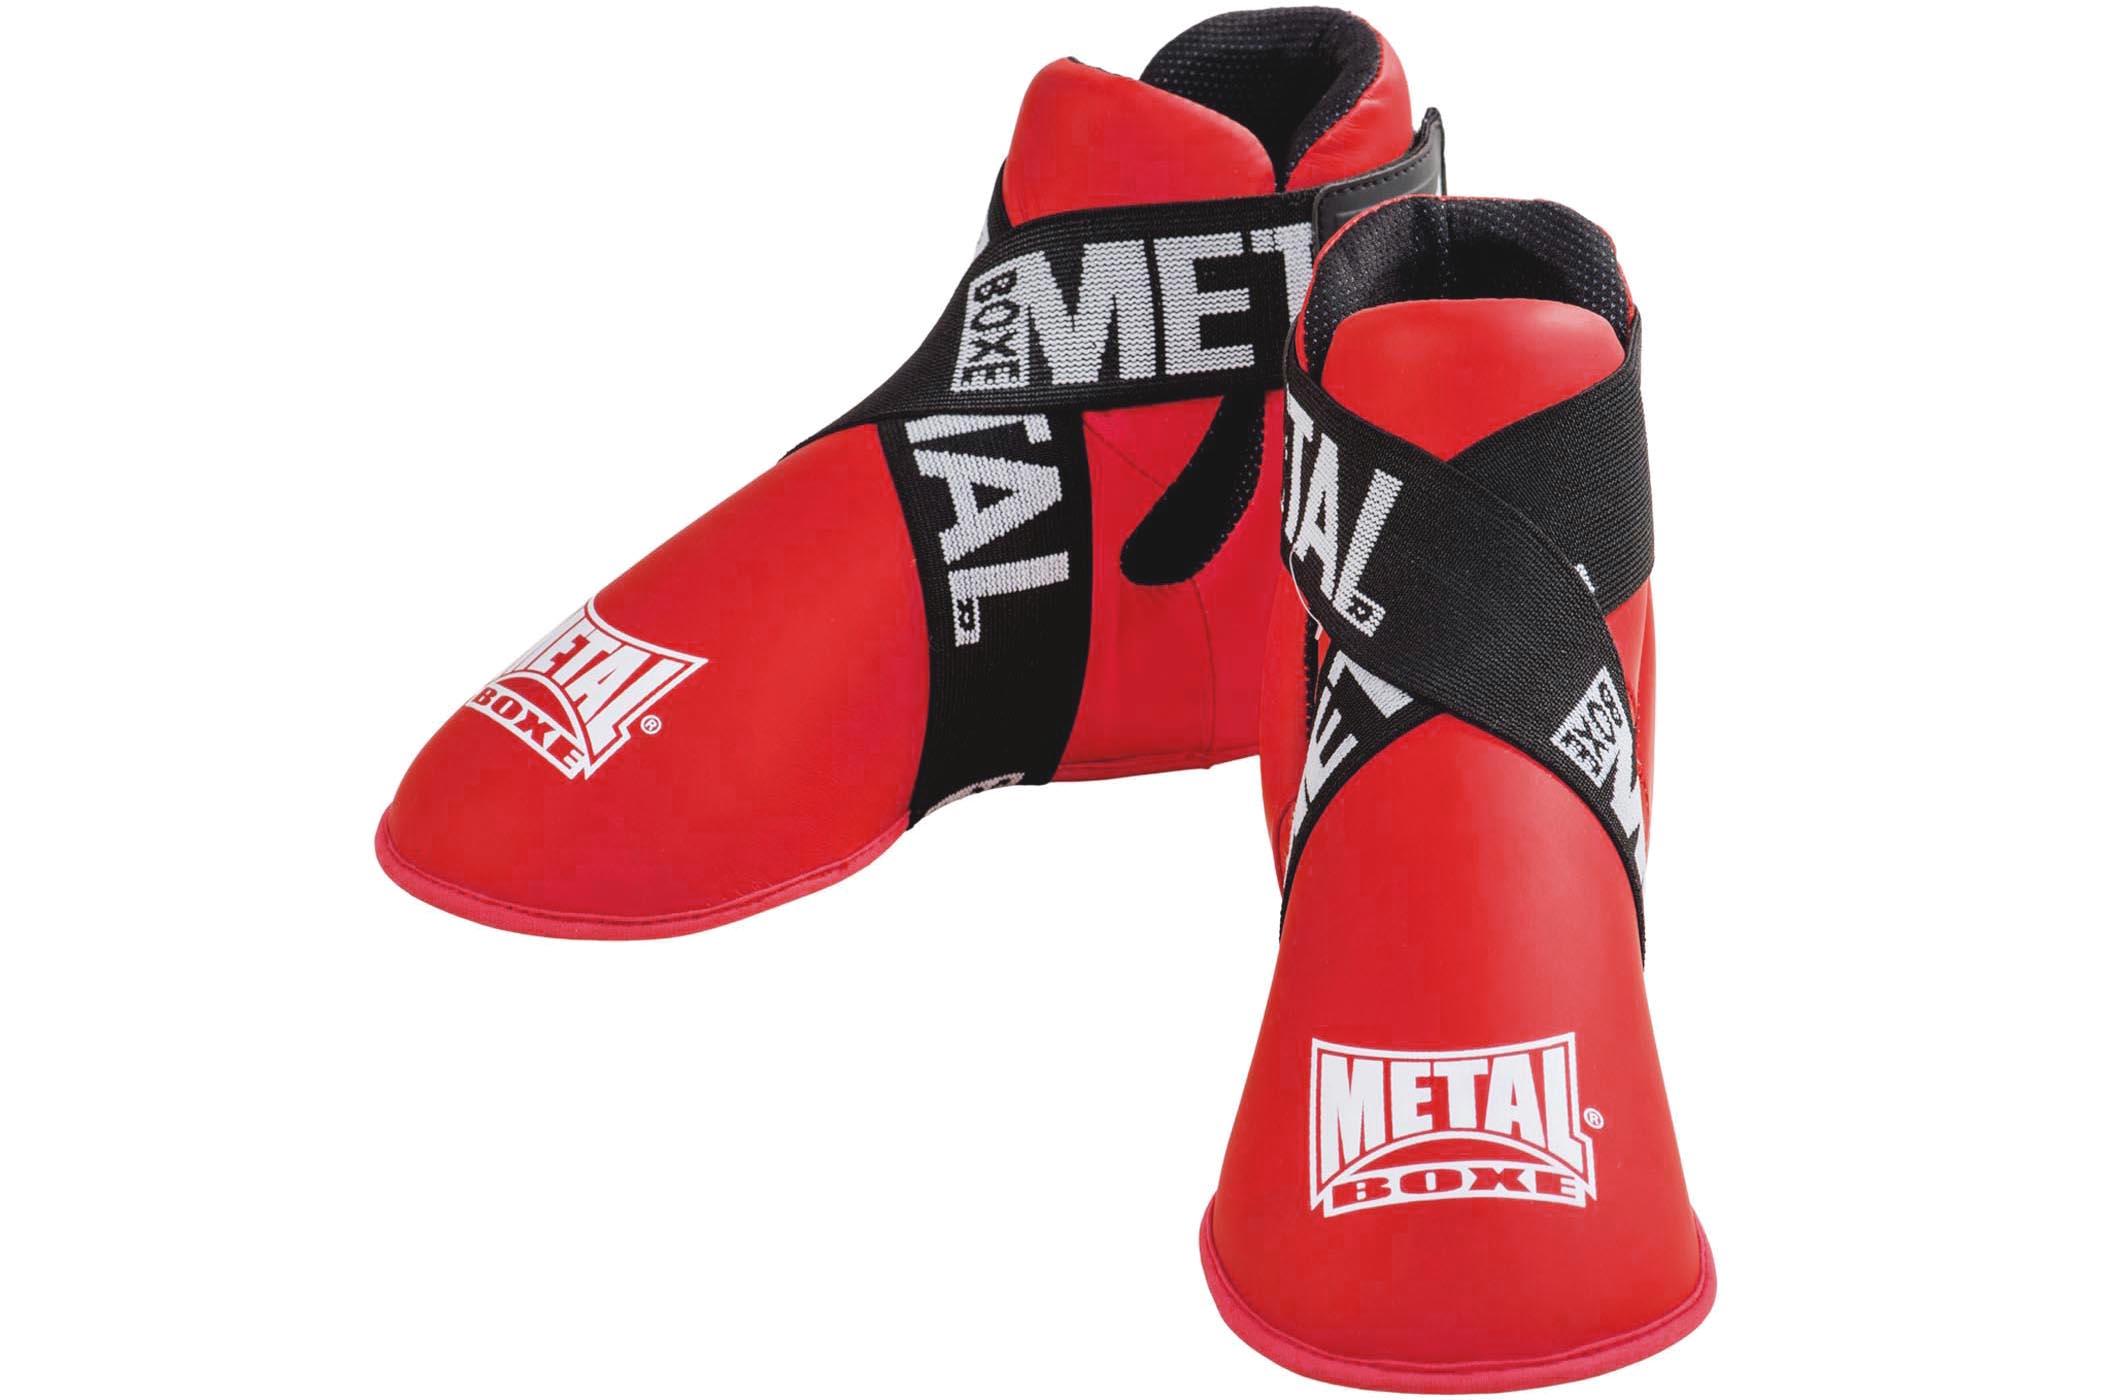 Step Pads, Full Contact - MB165, Metal Boxe